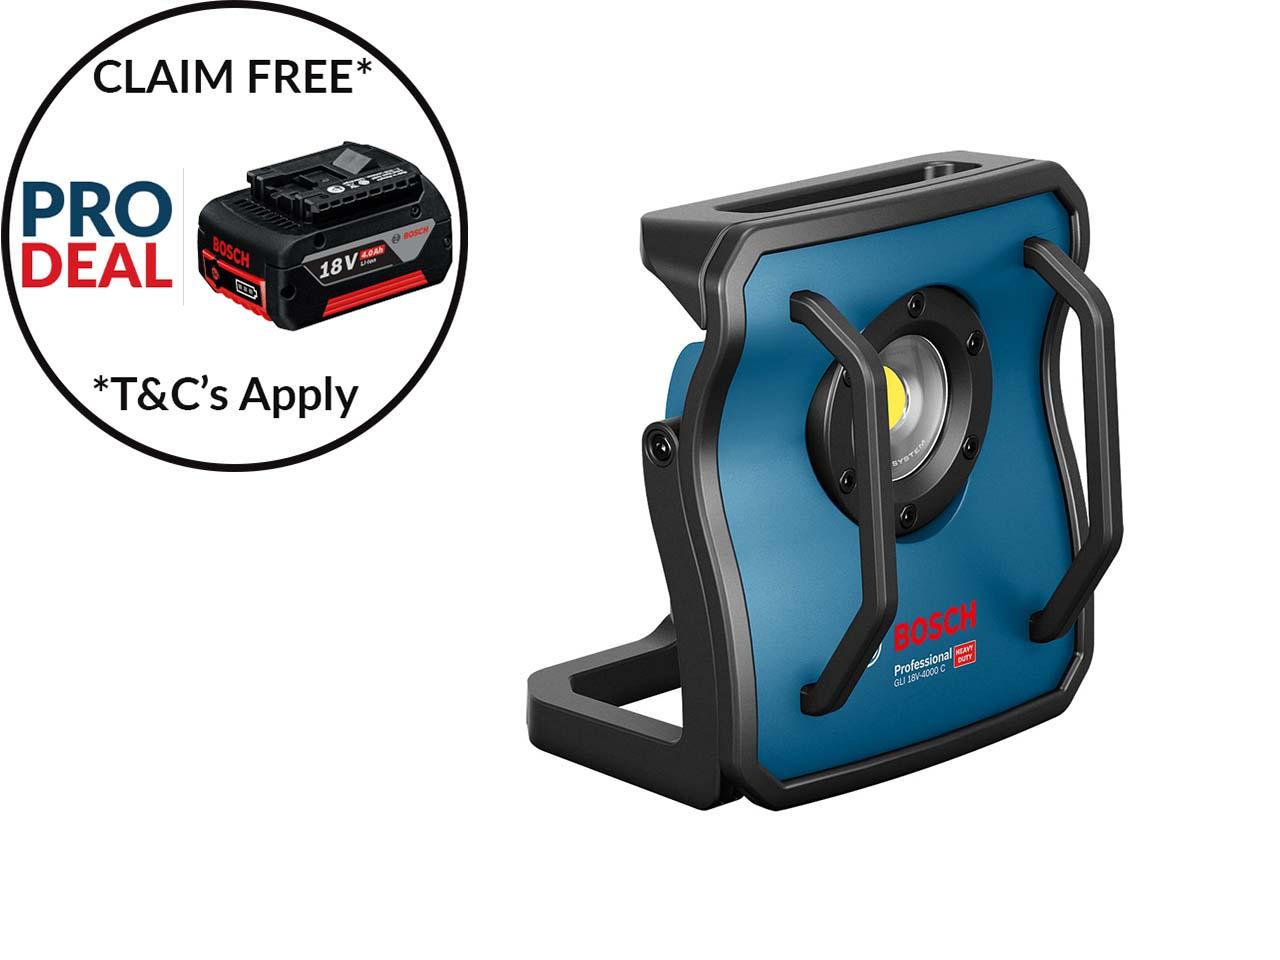 Bosch_GLI18V4000C.jpg